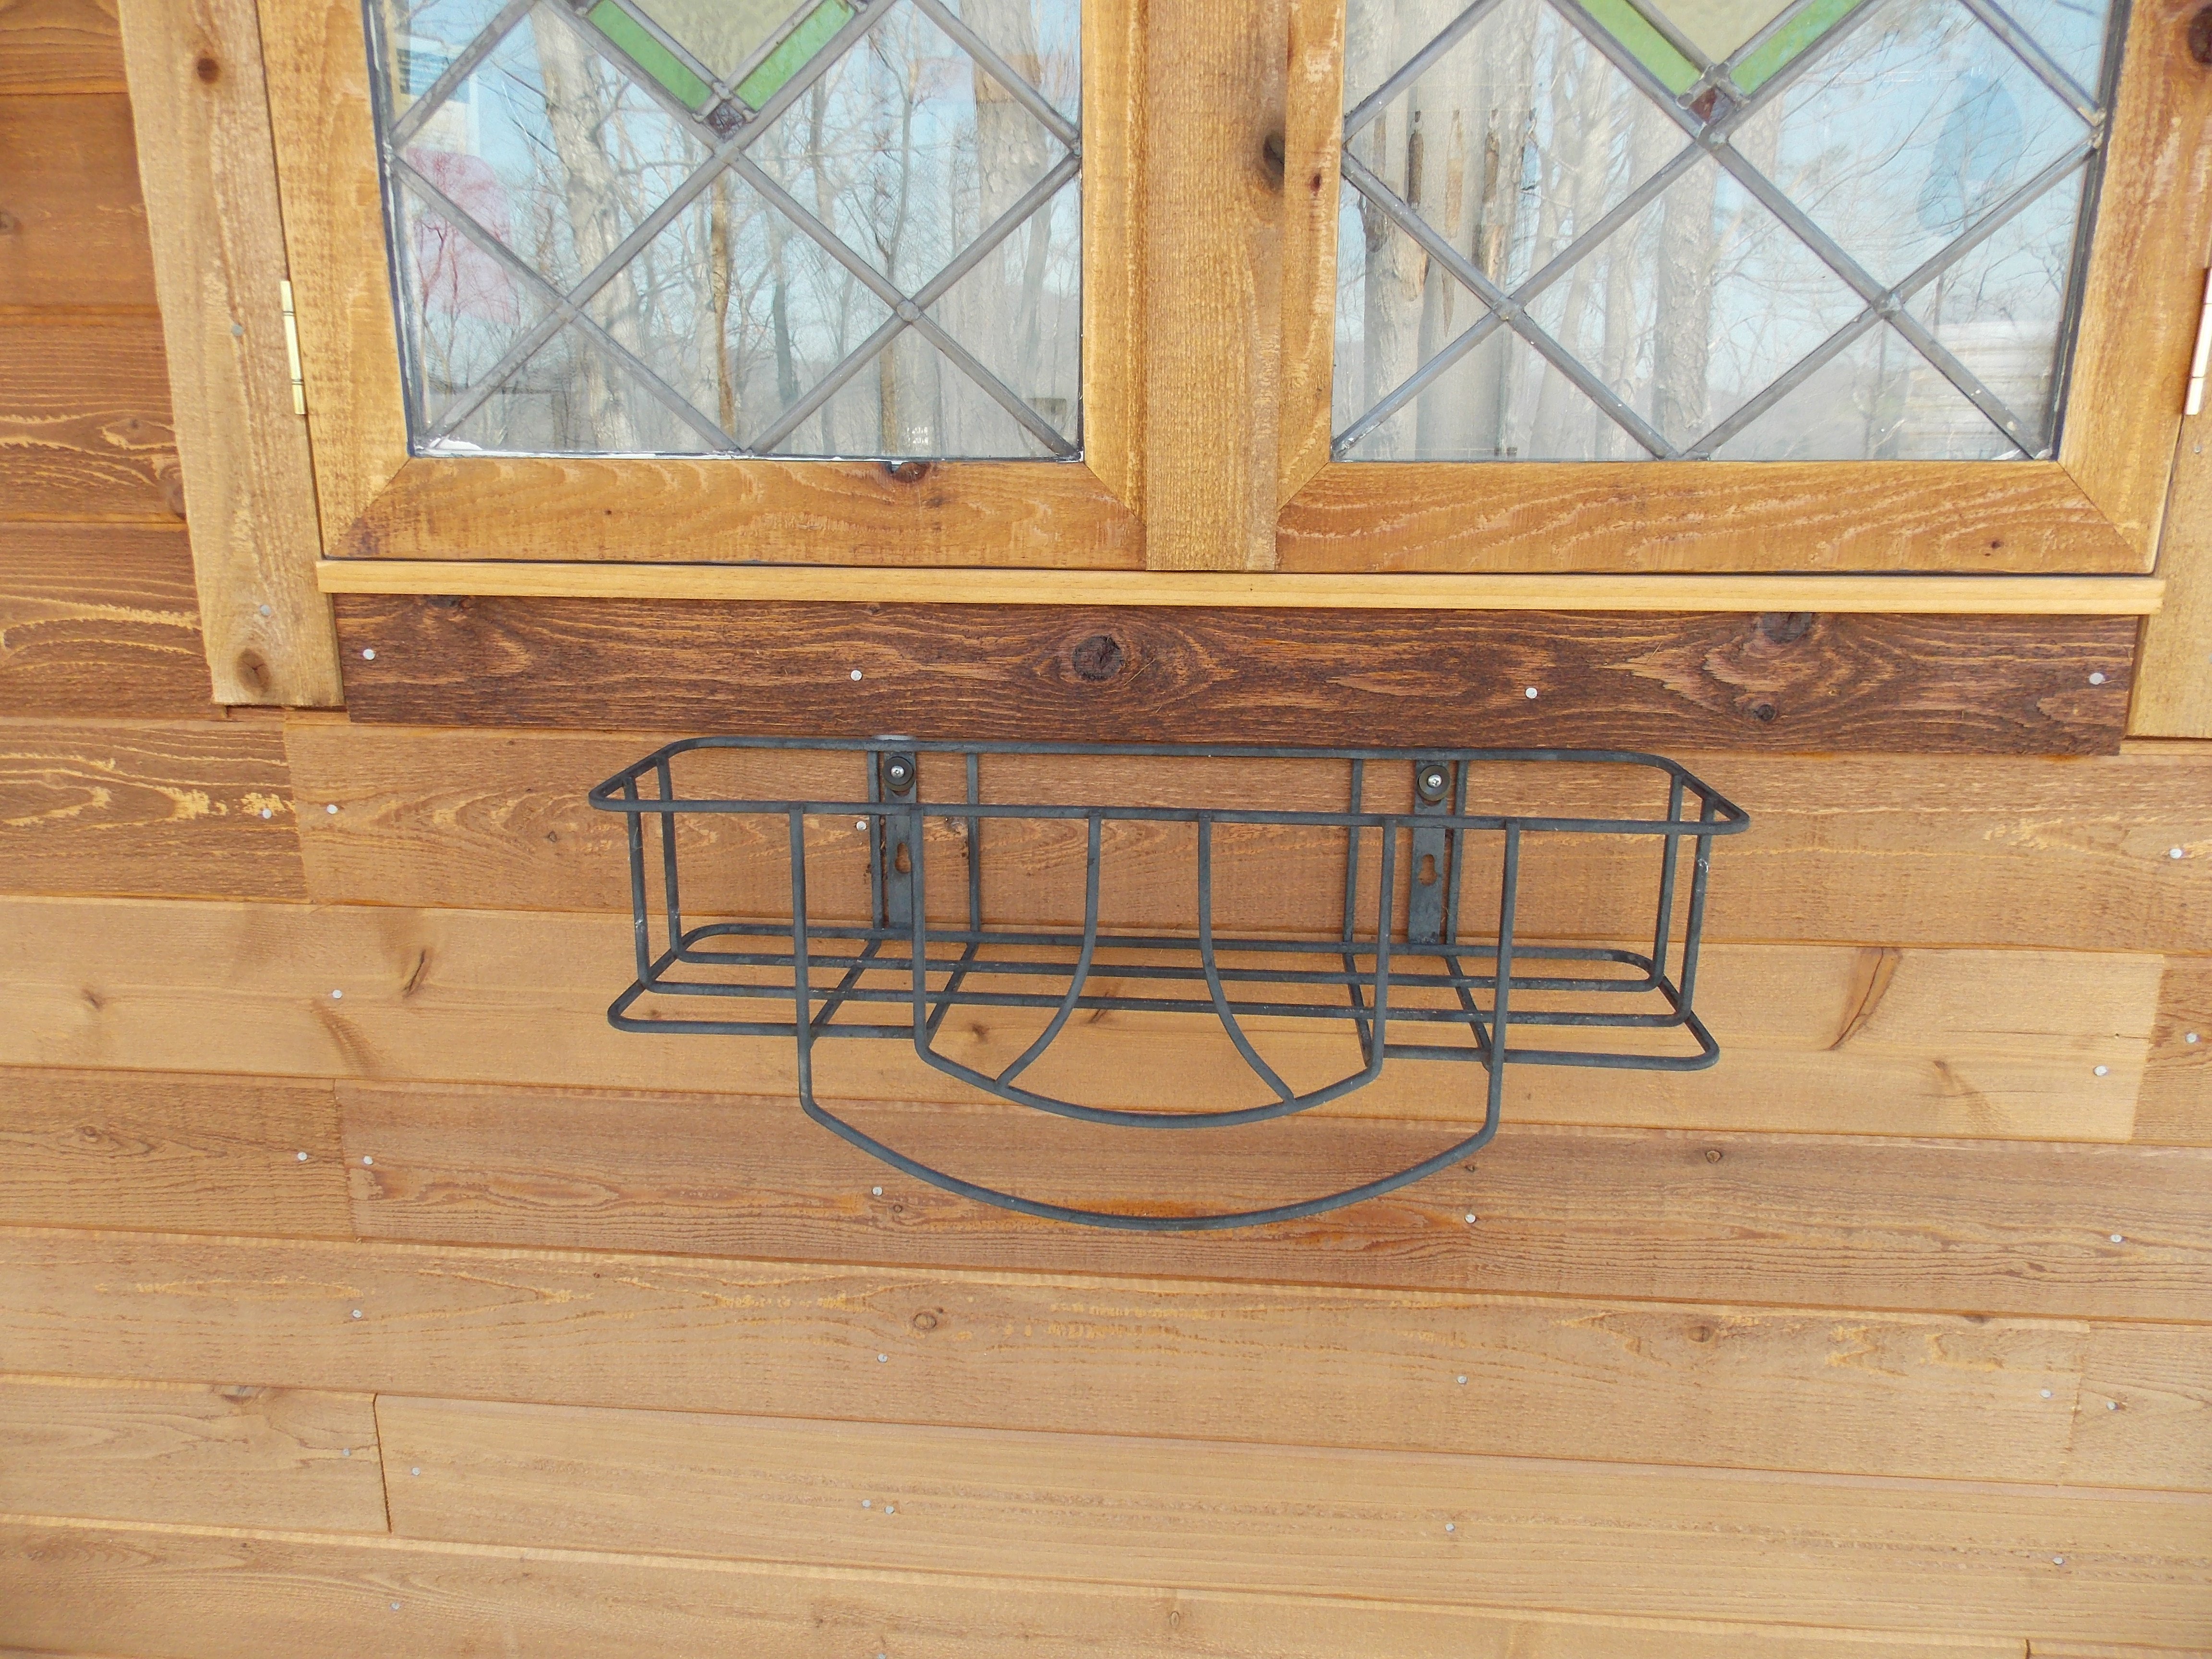 Wrought Iron Planter Needs Wood Liner